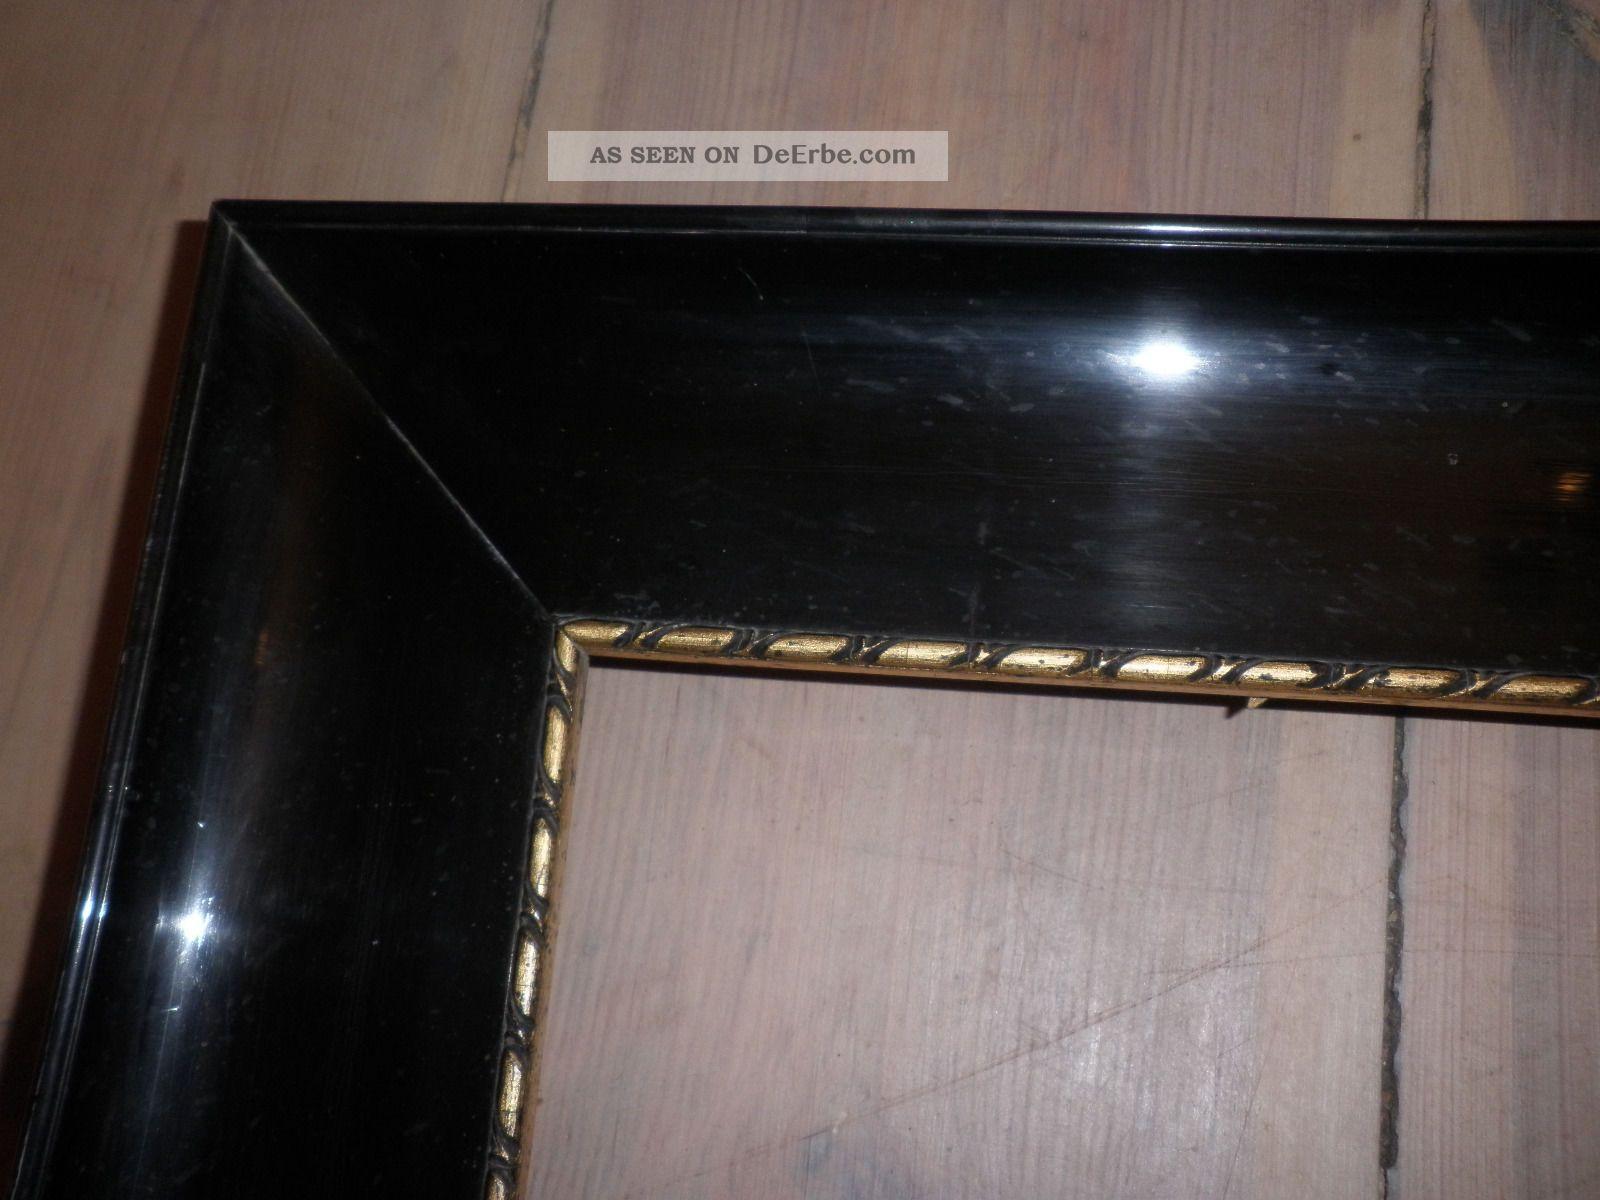 Mobiliar & Interieur - Spiegel & Rahmen - Rahmen - Antike Originale ...